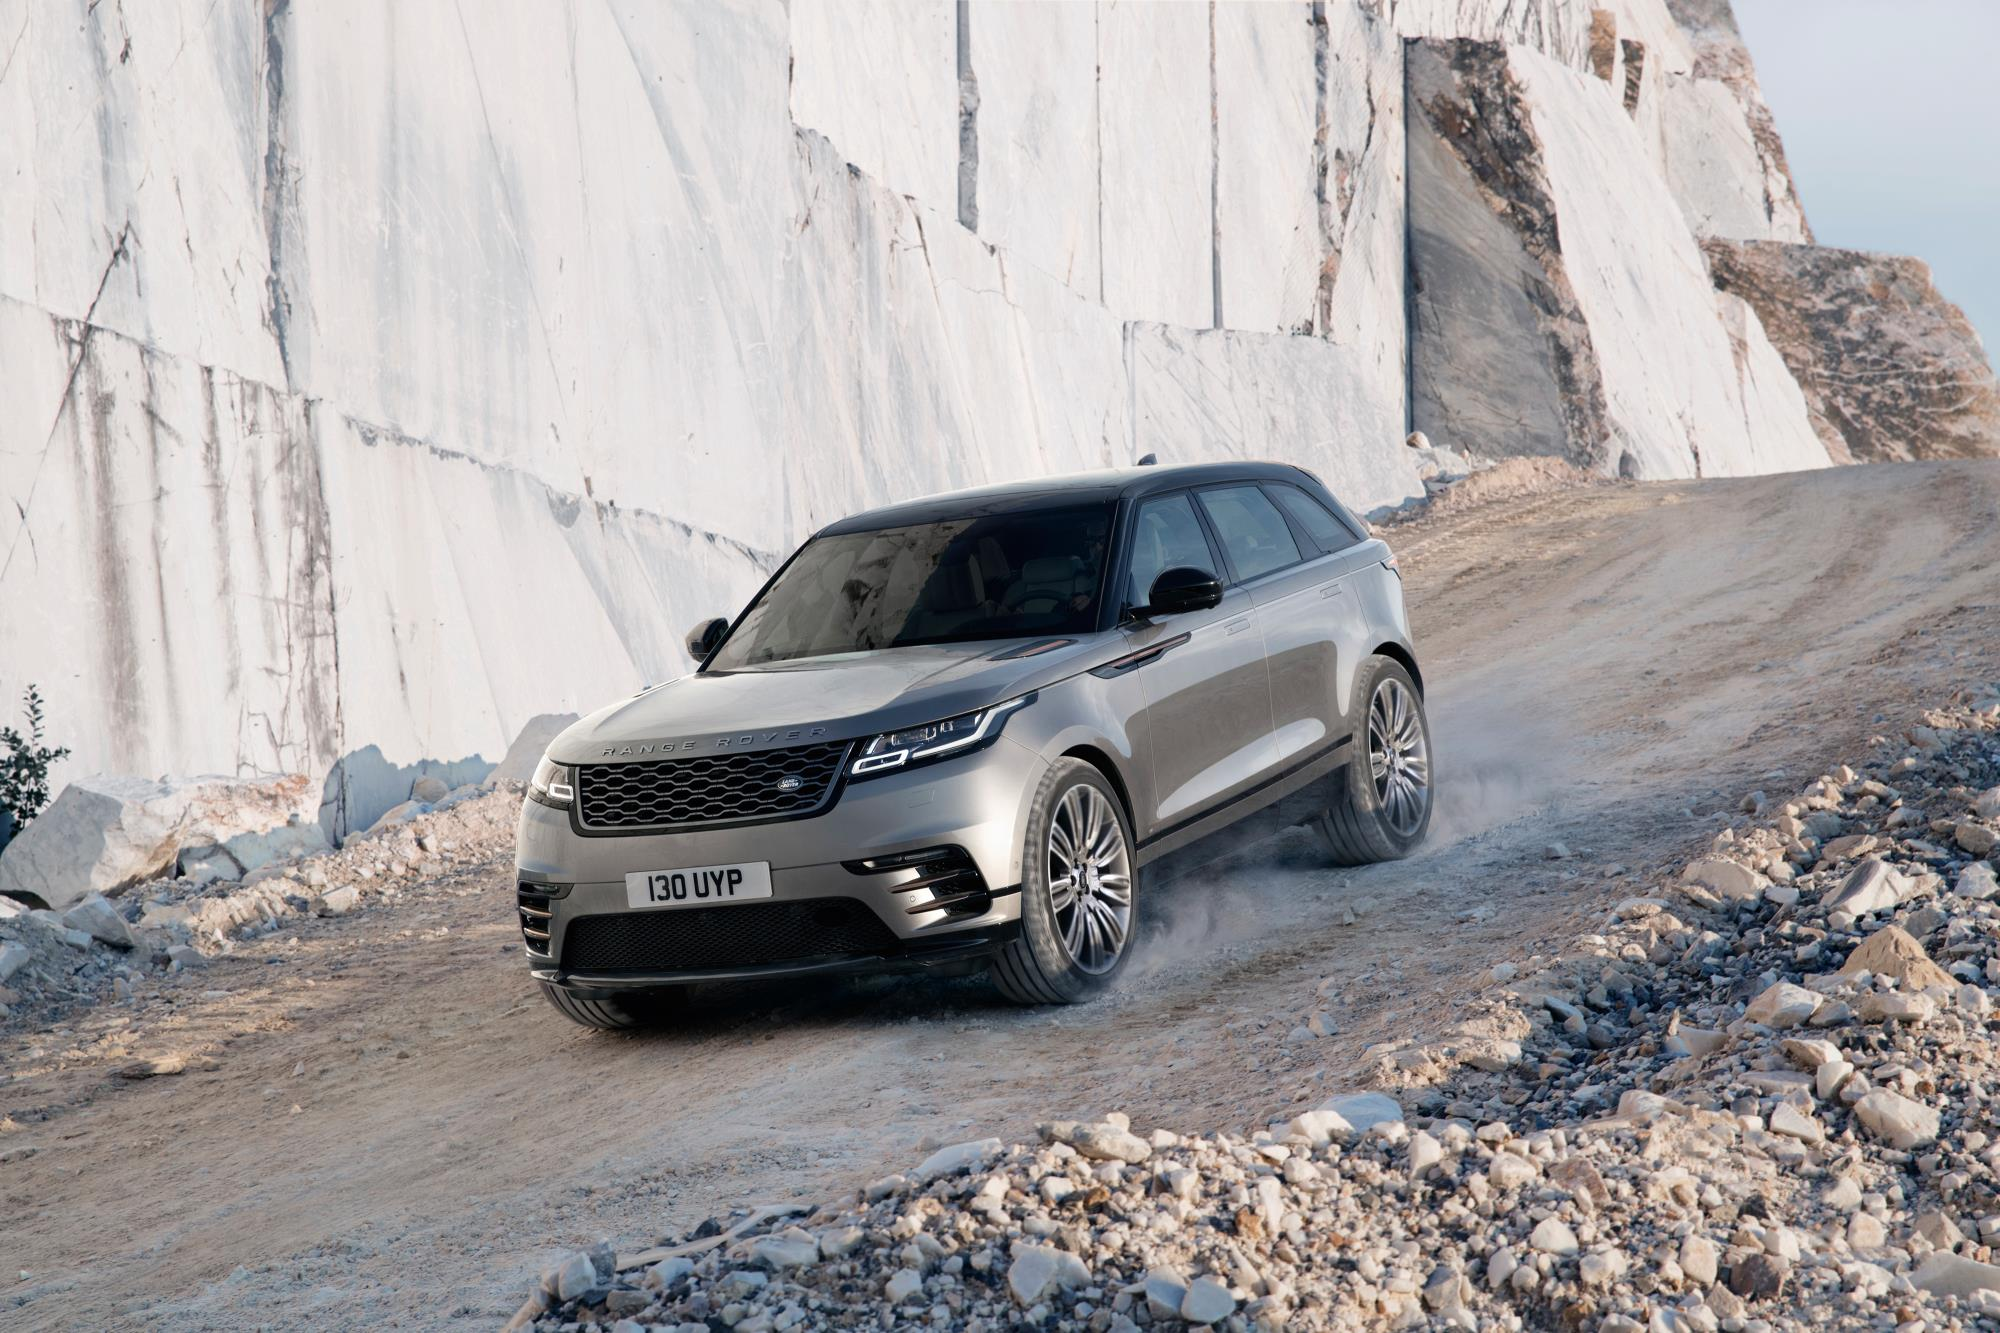 2018 Range Rover Velar Is a No Holds Barred Luxury SUV autoevolution